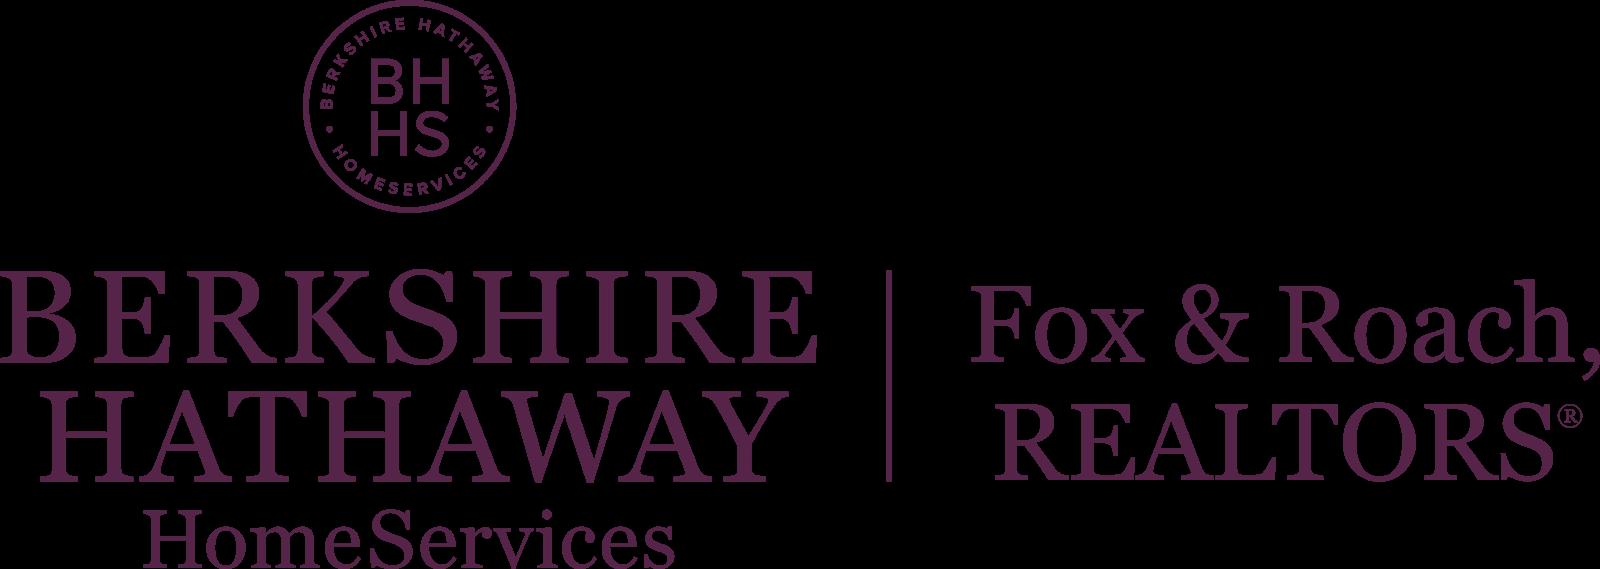 BHHS Fox & Roach Realtors